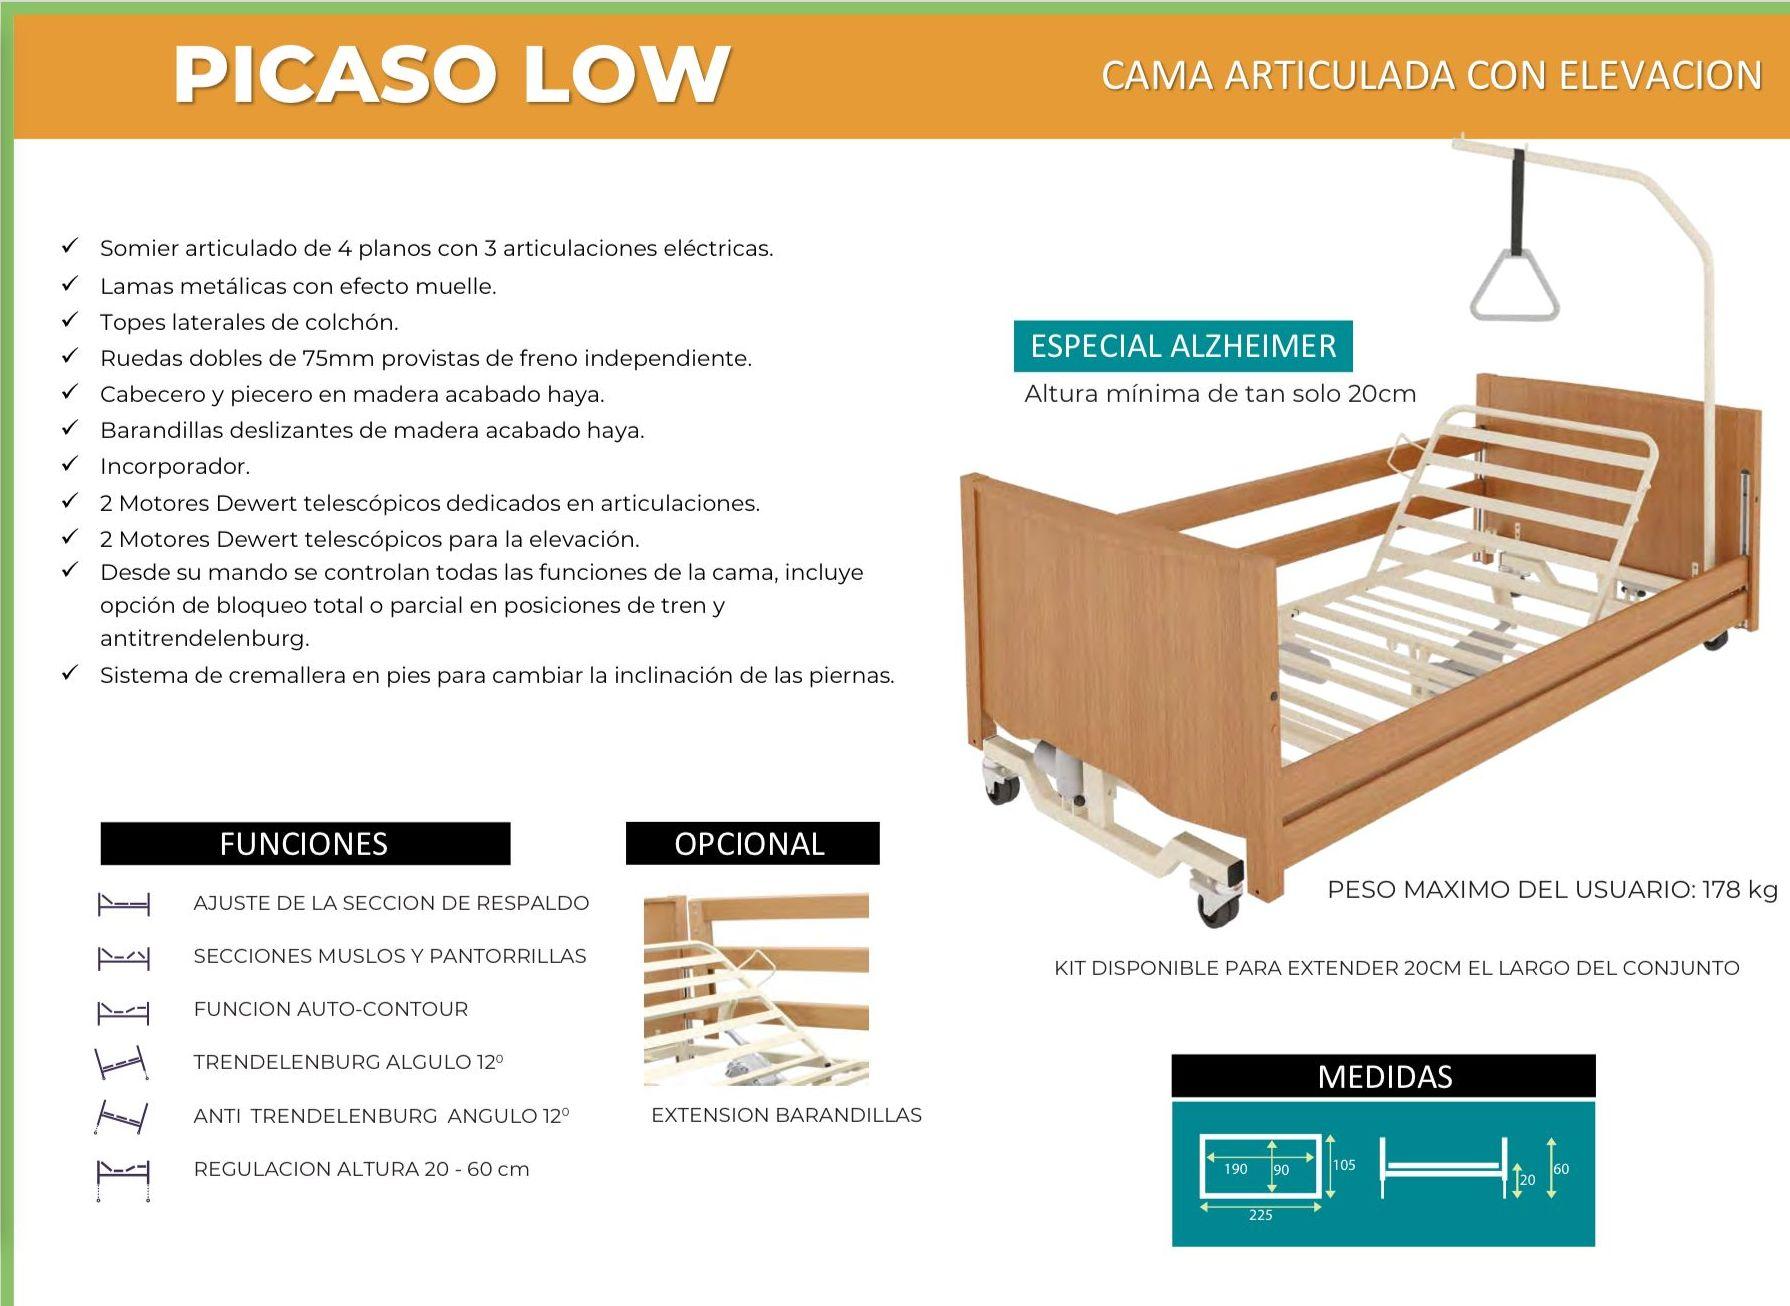 Cama Articulada Picaso Low: TIENDA ONLINE de Ortopedia La Fama